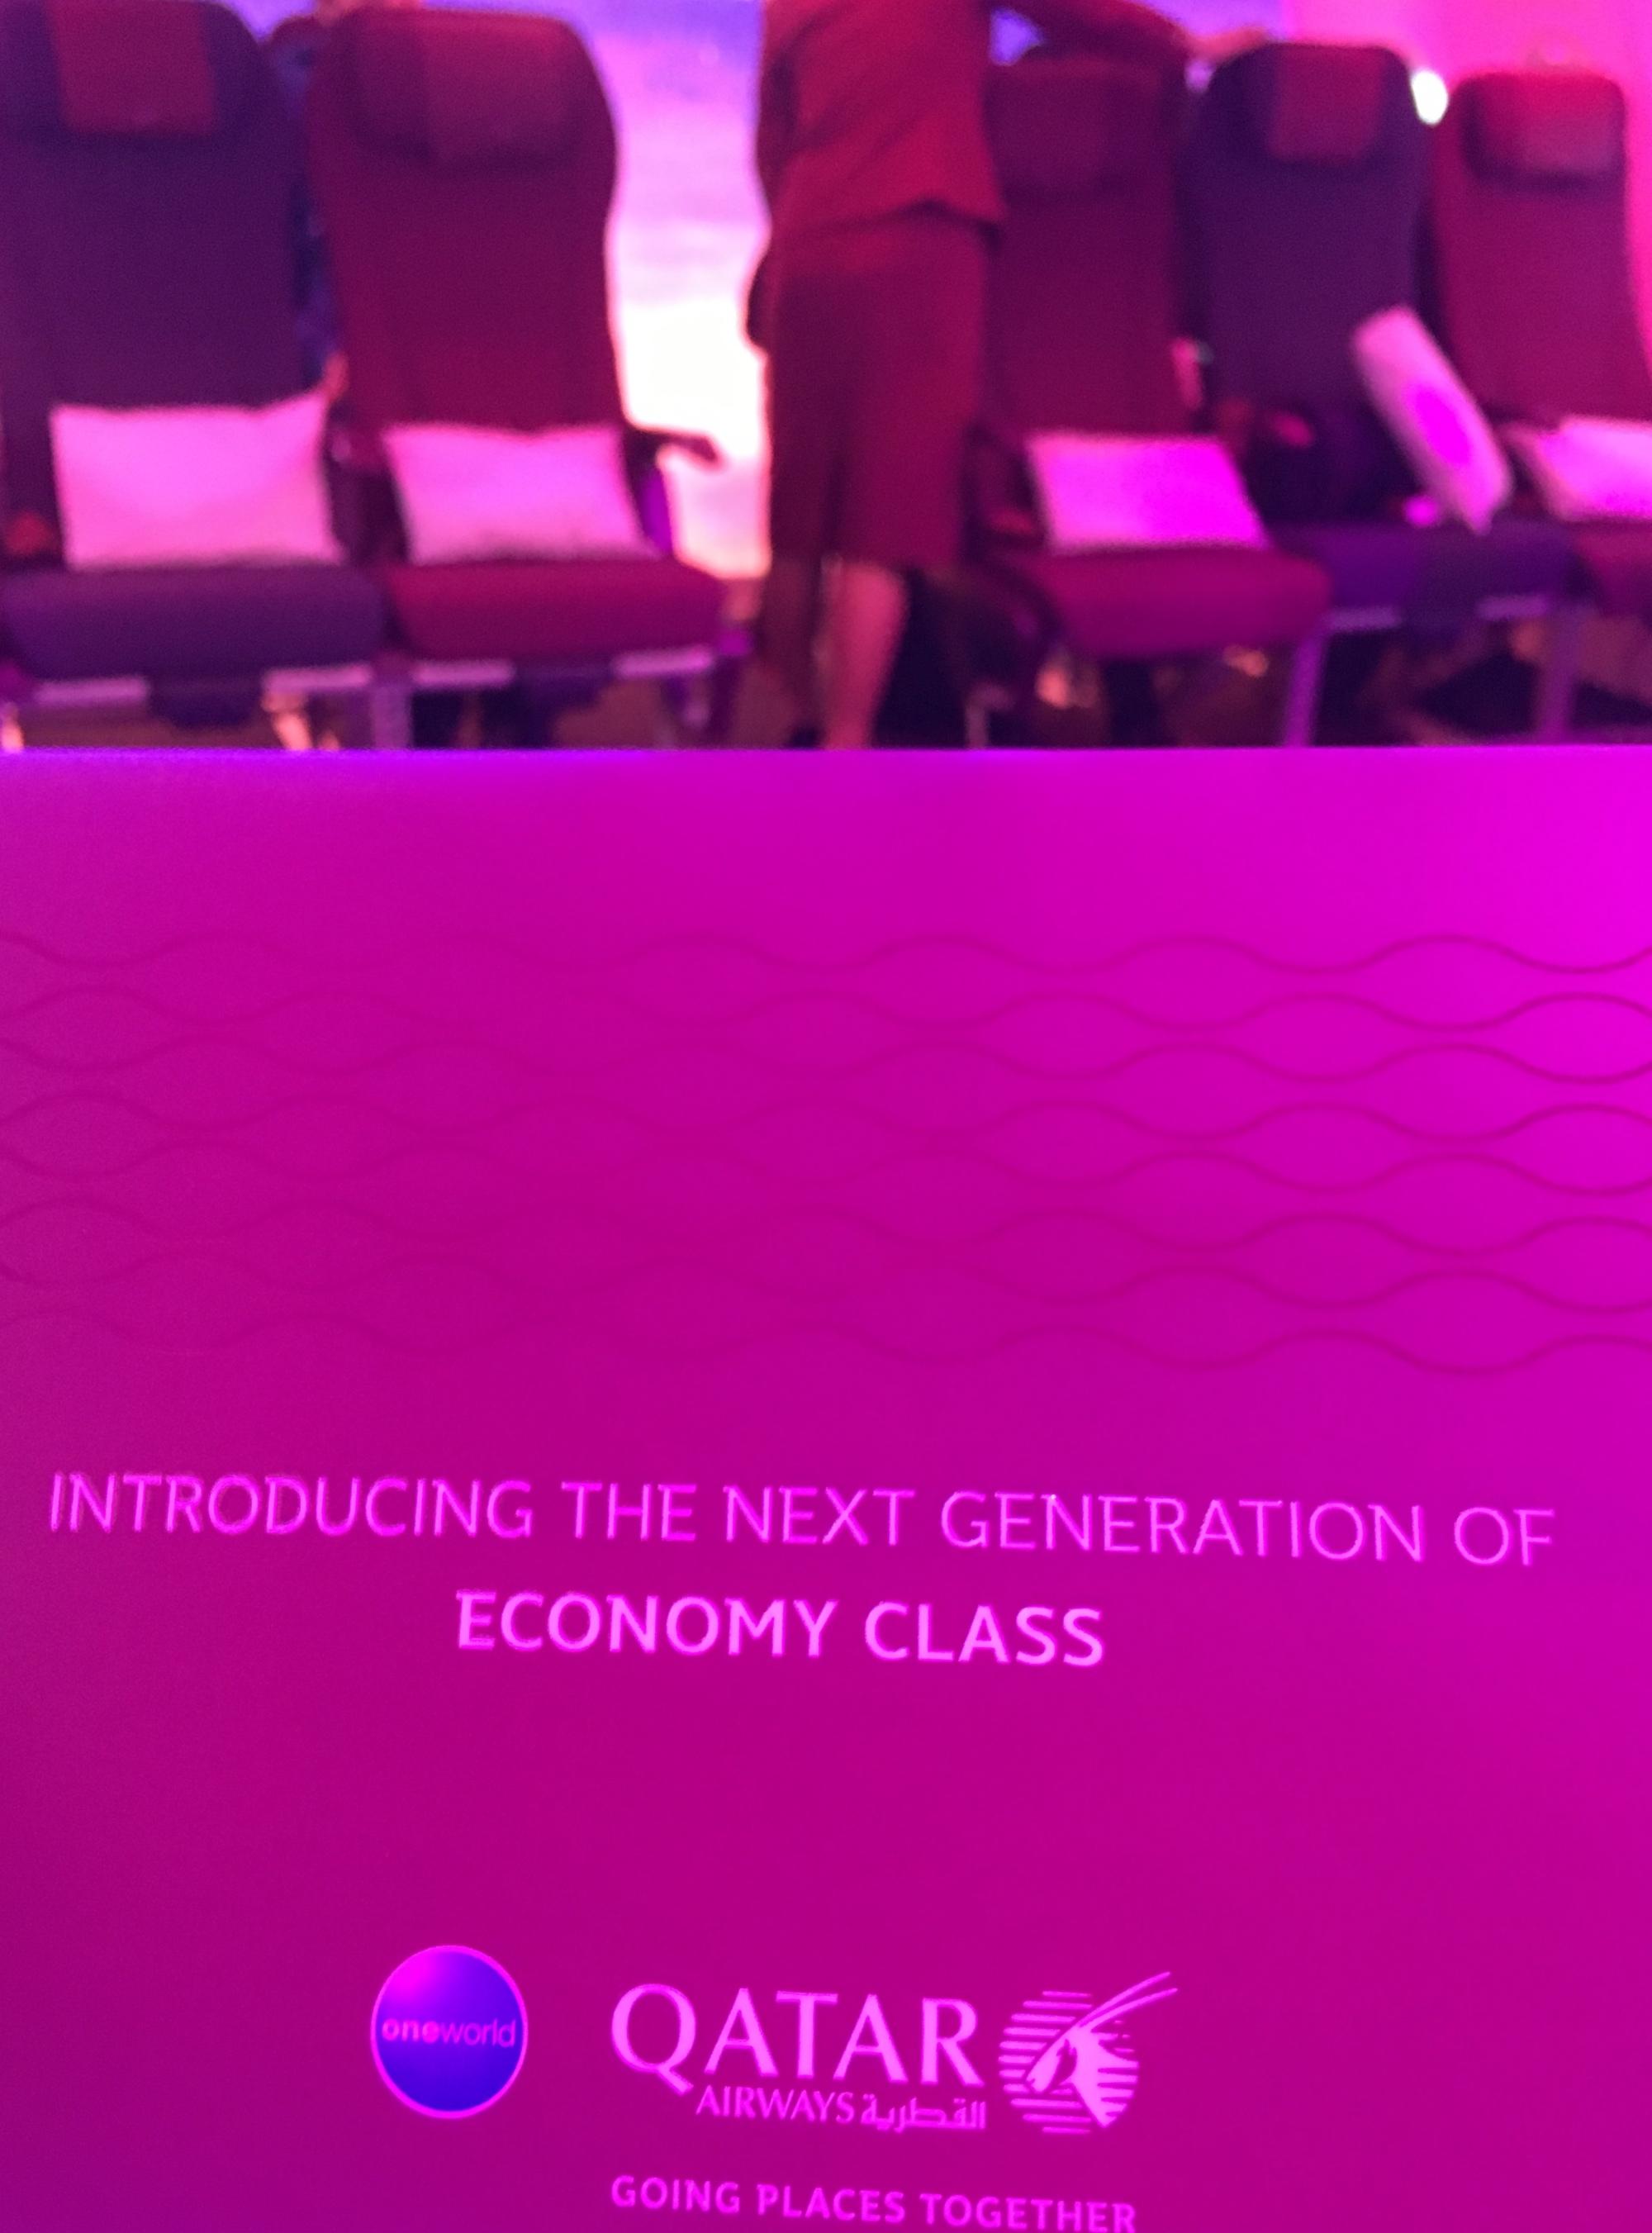 Qatar Airways' revolutionary new economy seat unveiled @itb_berlin